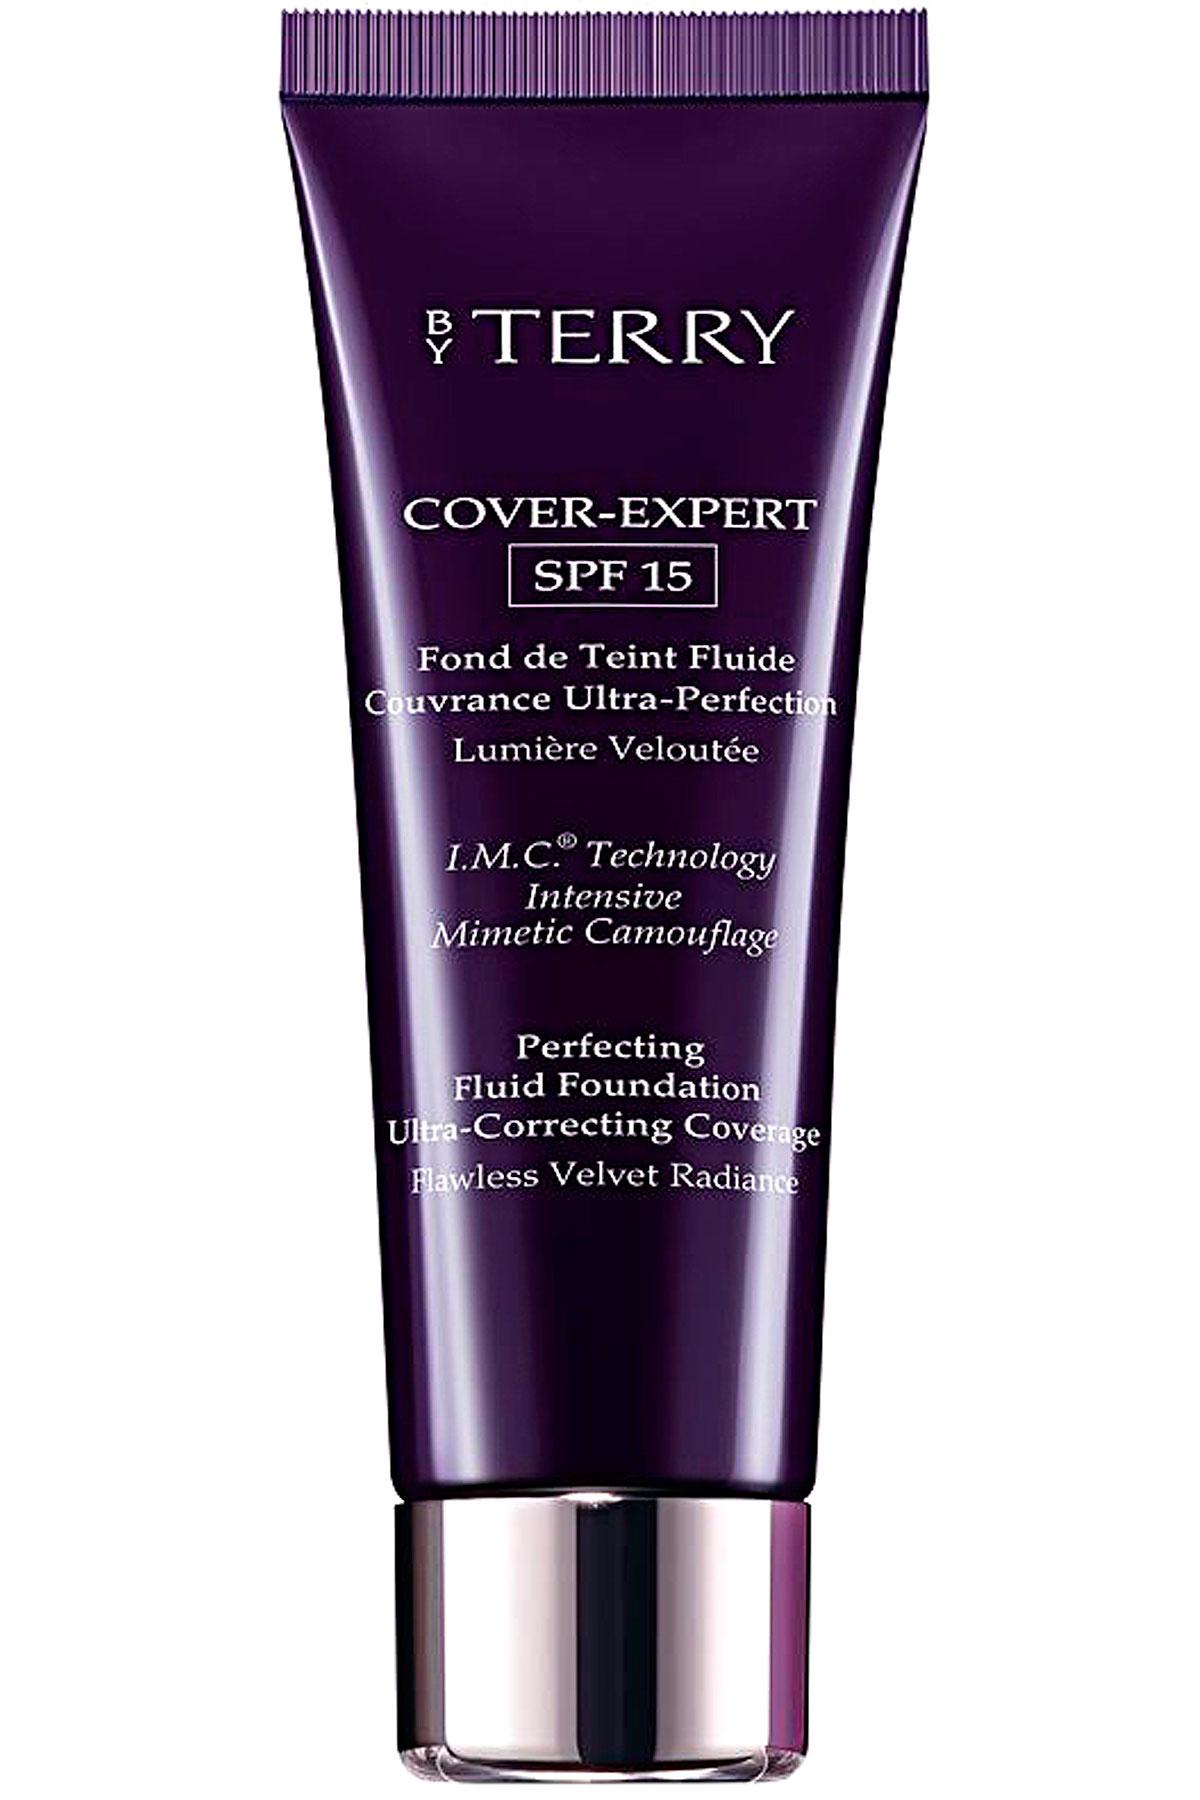 By Terry Makeup for Women, Cover-expert Spf15 - N.5 Peach Beige - 35 Ml, Peach Beige, 2019, 35 ml